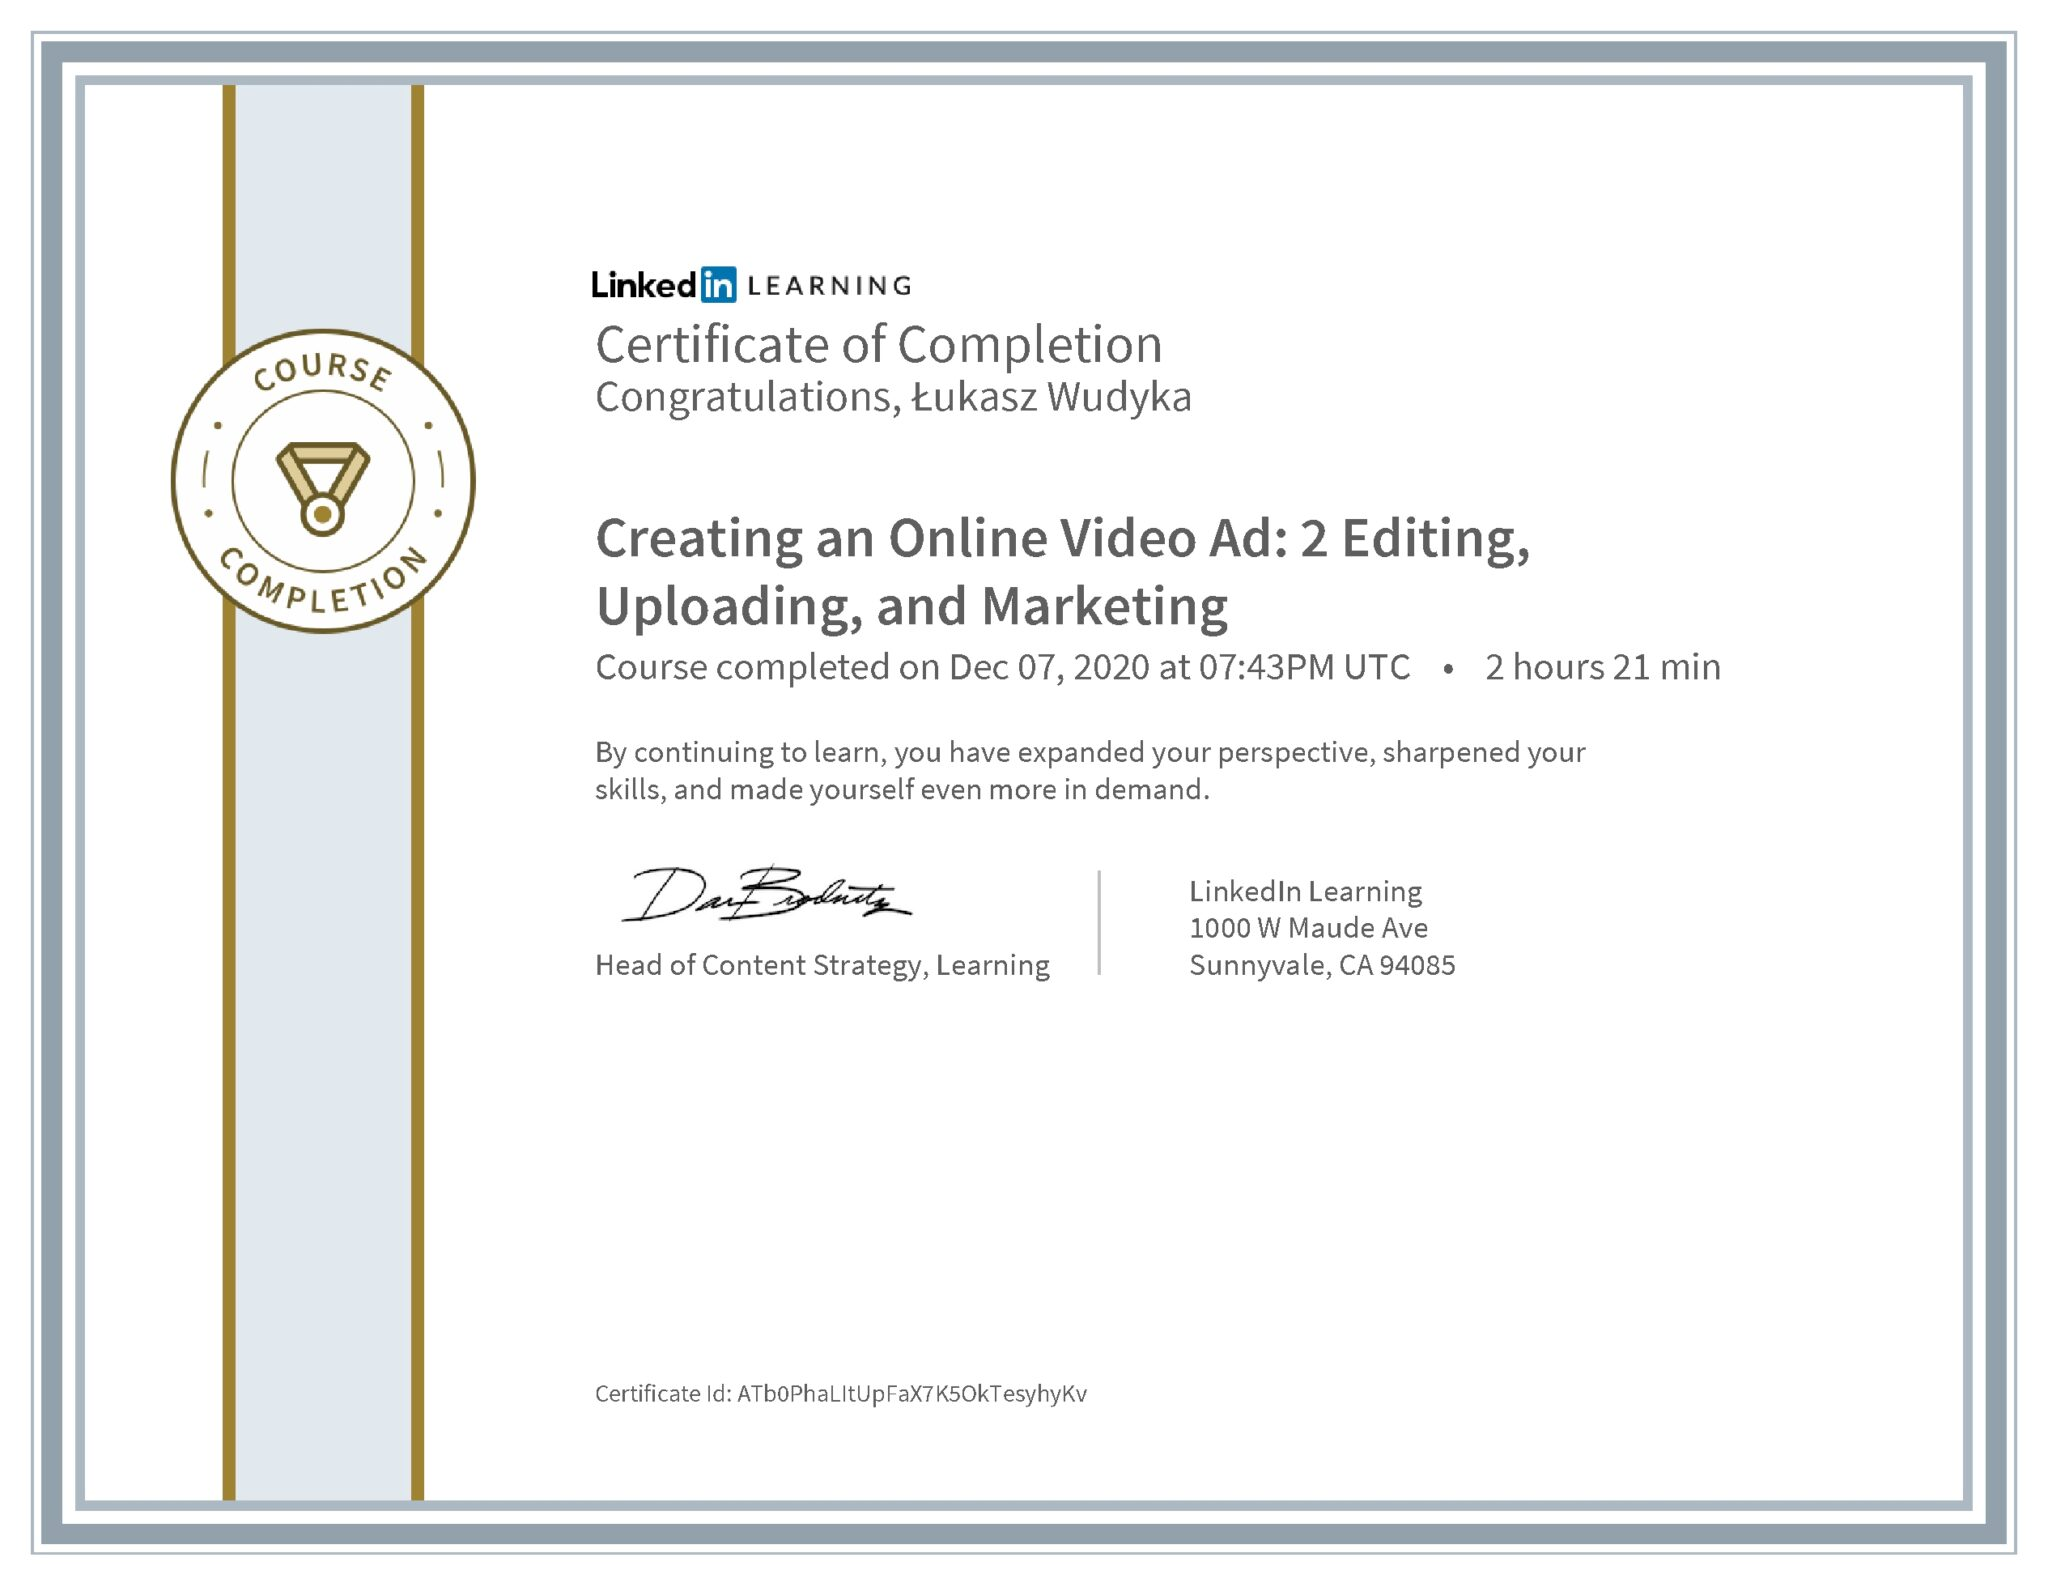 Łukasz Wudyka certyfikat LinkedIn Creating an Online Video Ad: 2 Editing, Uploading, and Marketing